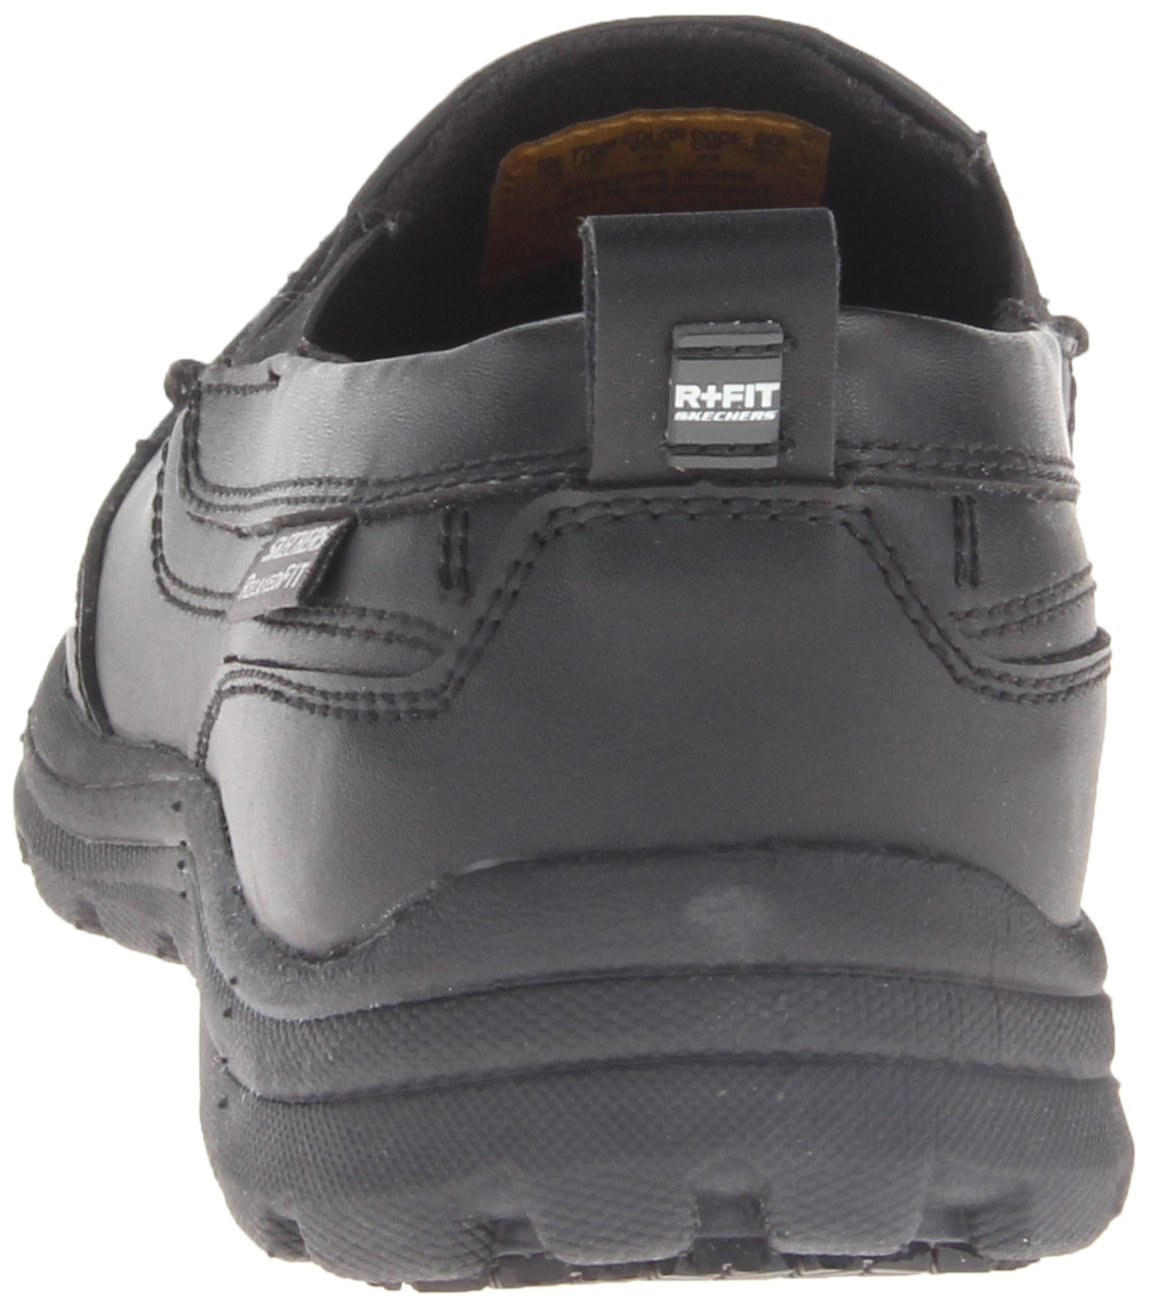 Skechers for Work Men's Hobbes Relaxed Fit Slip Resistant Work Shoe, Black, 11.5 M US by Skechers (Image #2)